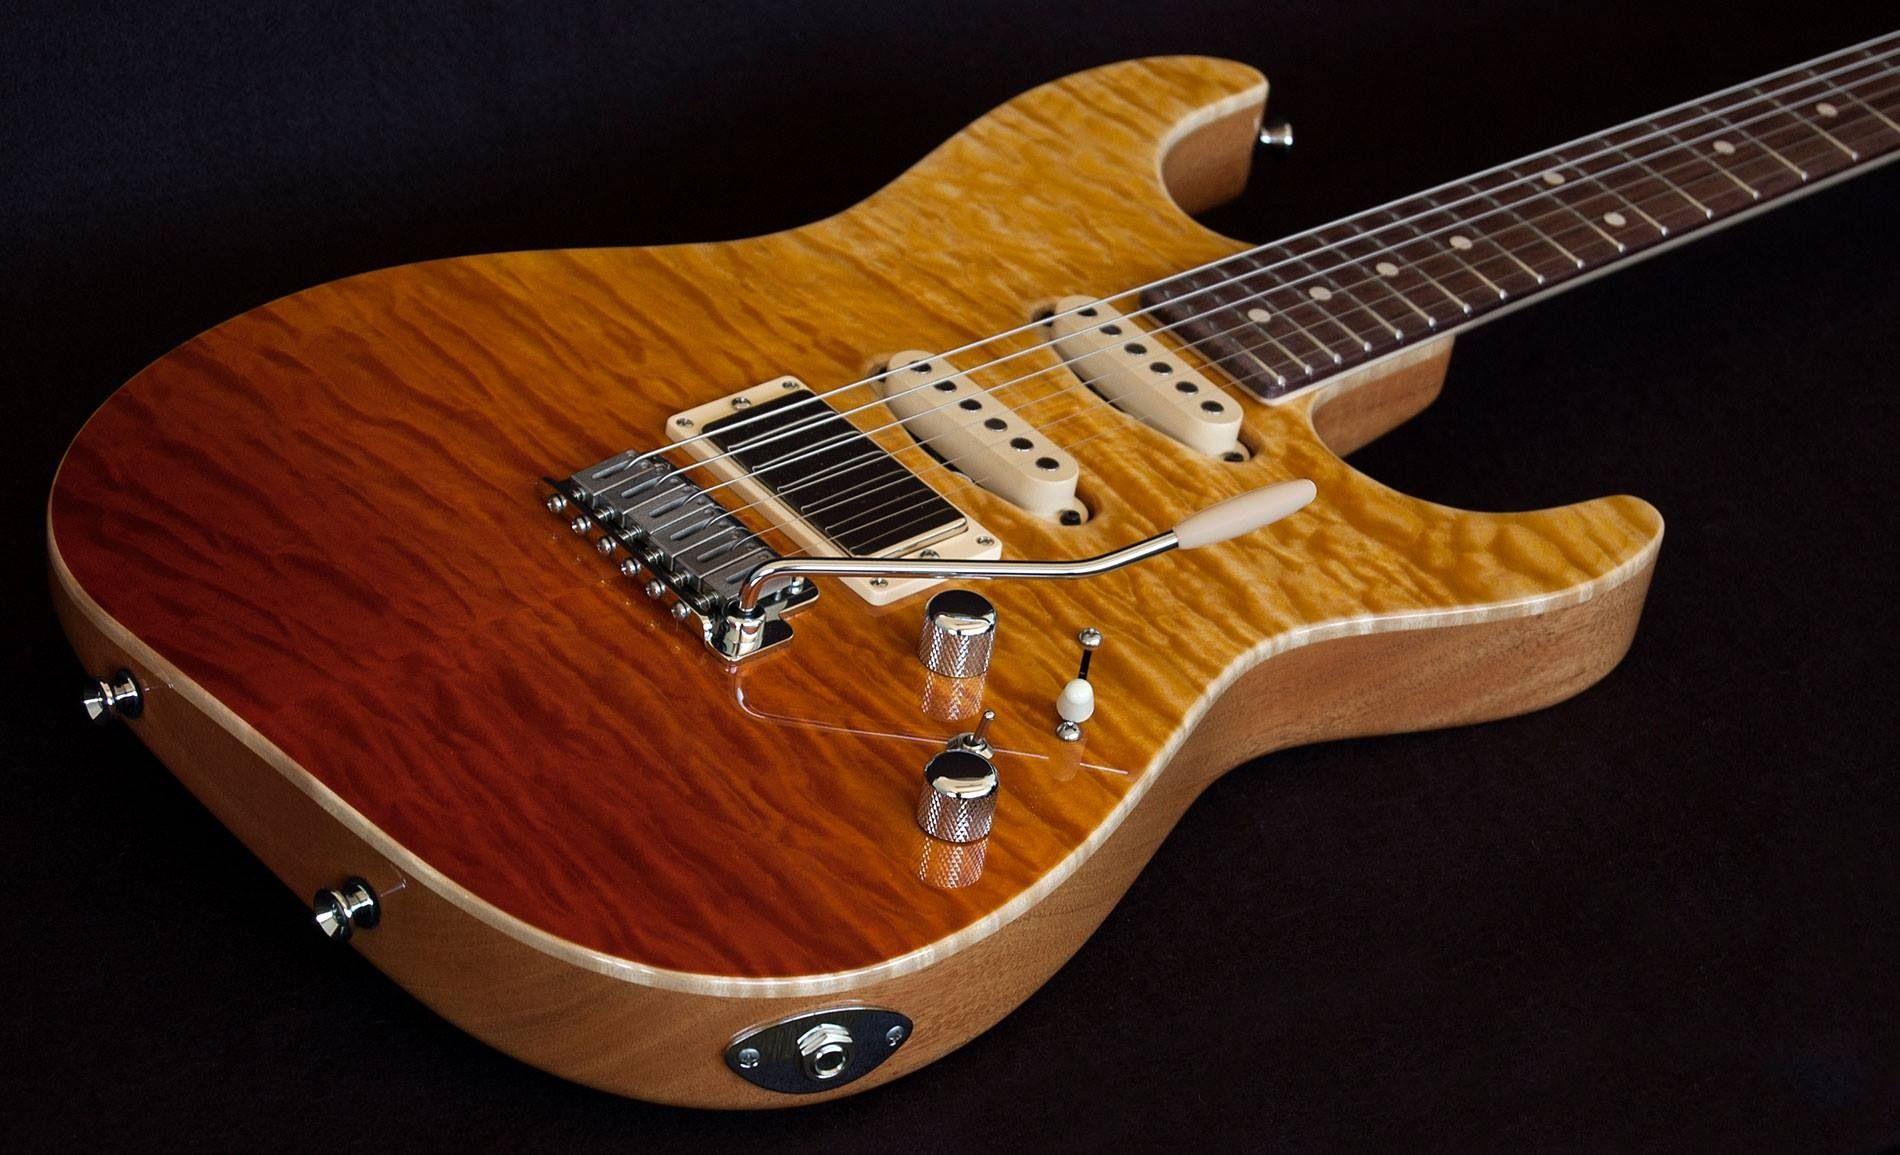 tom anderson droptop guitars pinterest. Black Bedroom Furniture Sets. Home Design Ideas